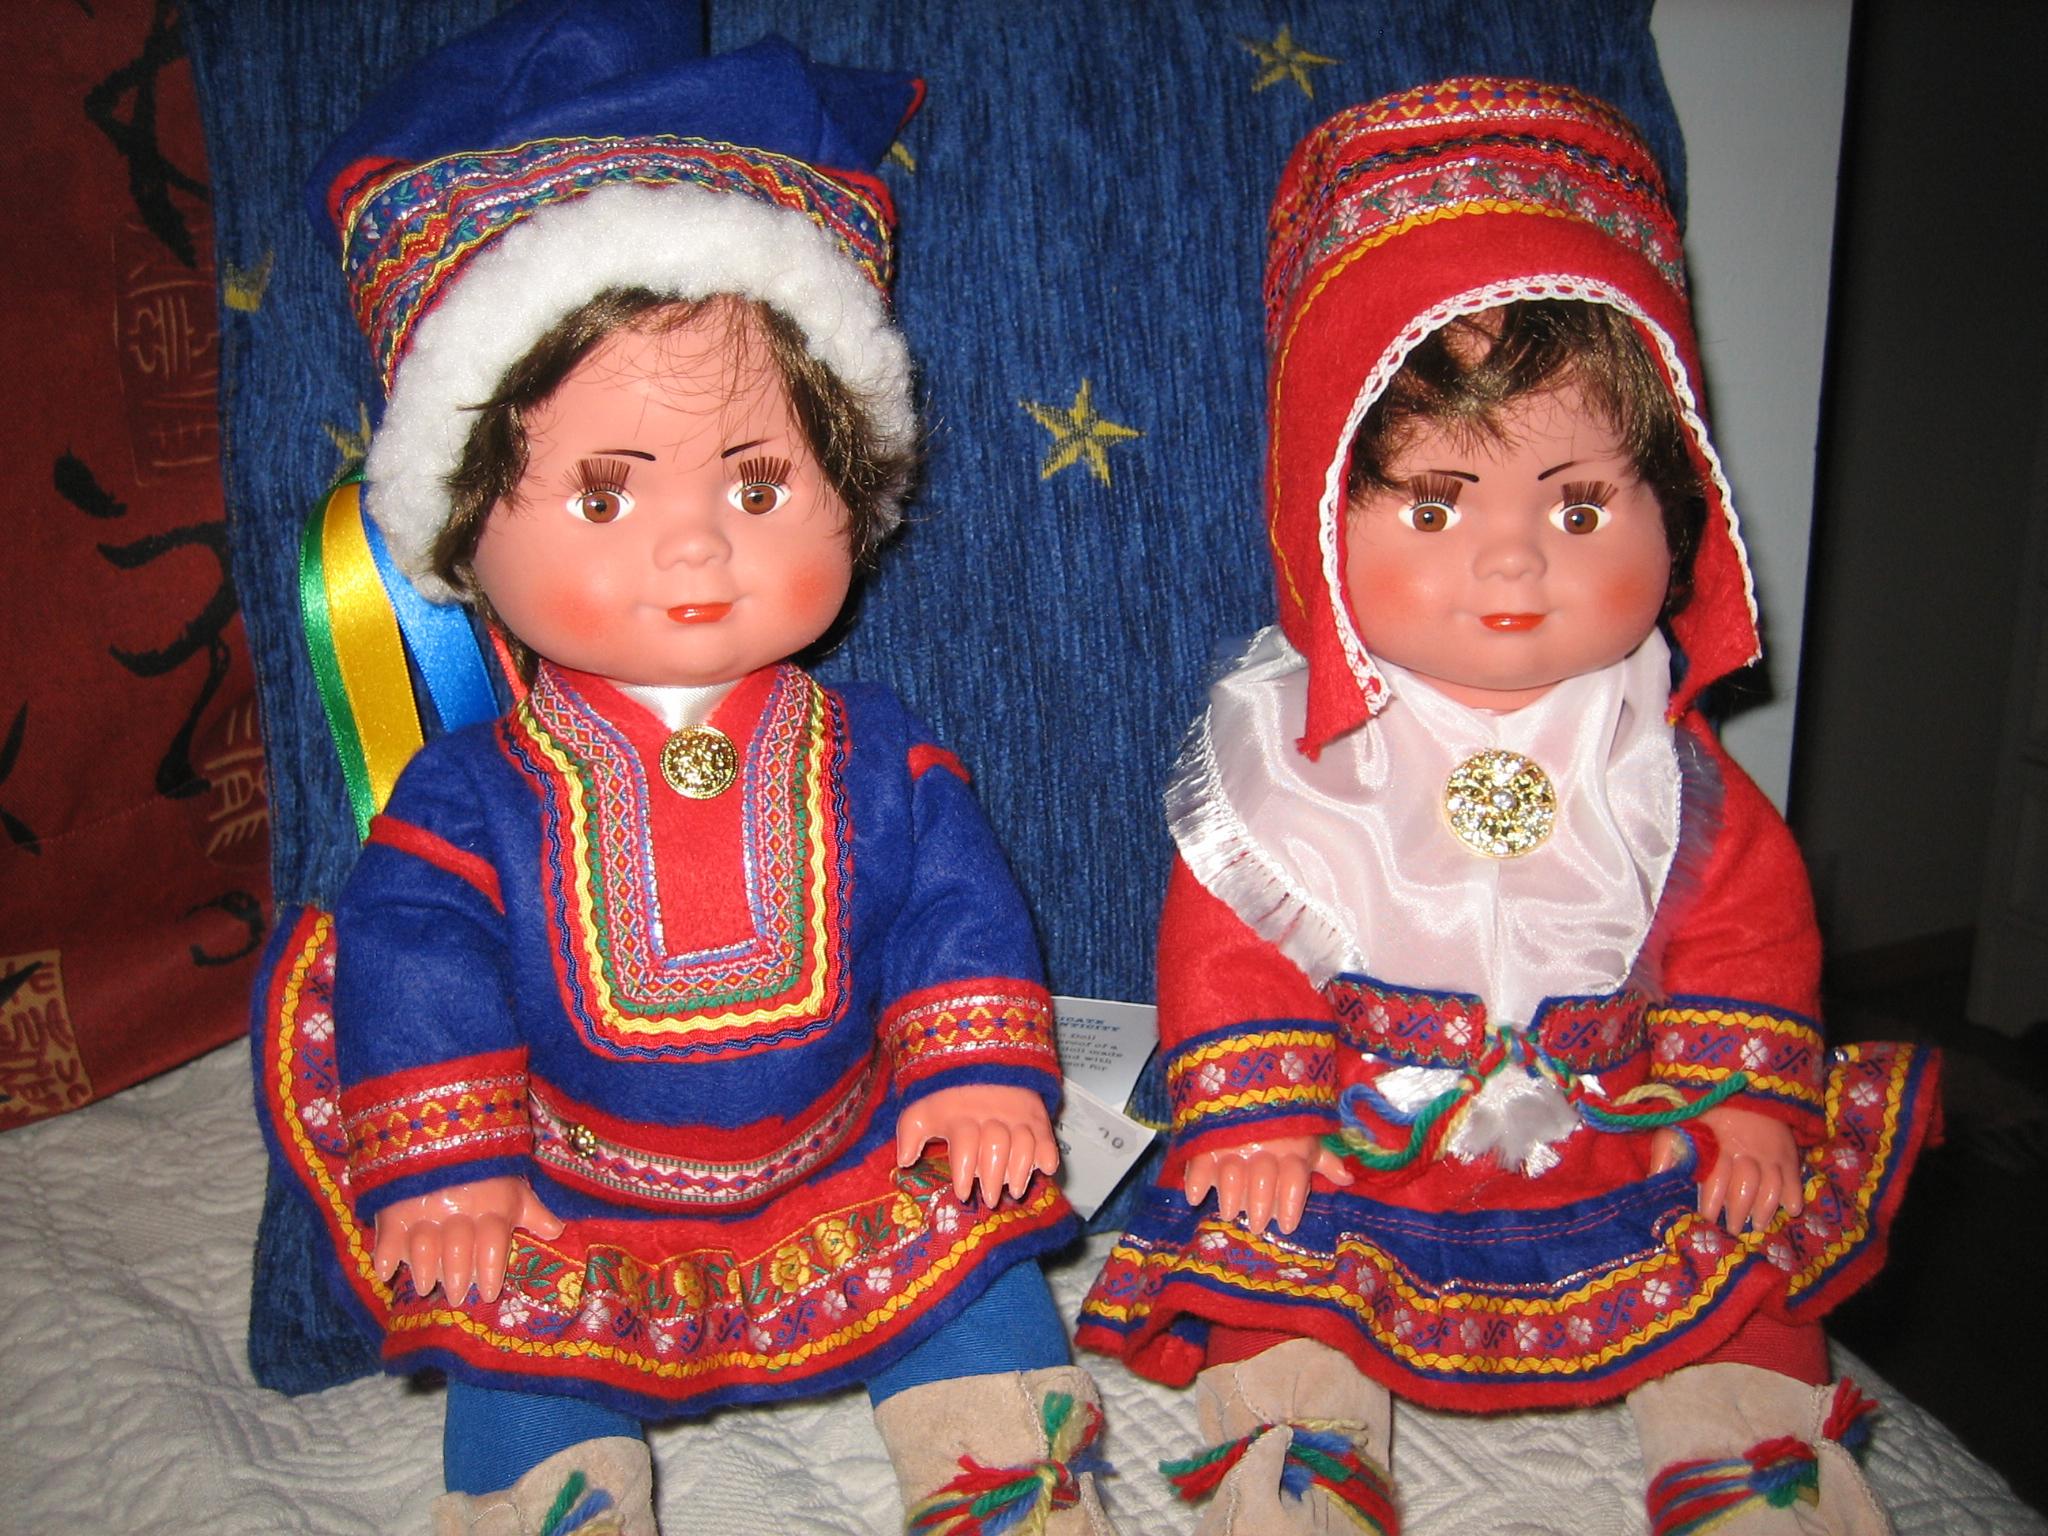 d7a4cf05892 Sámi traditional dress